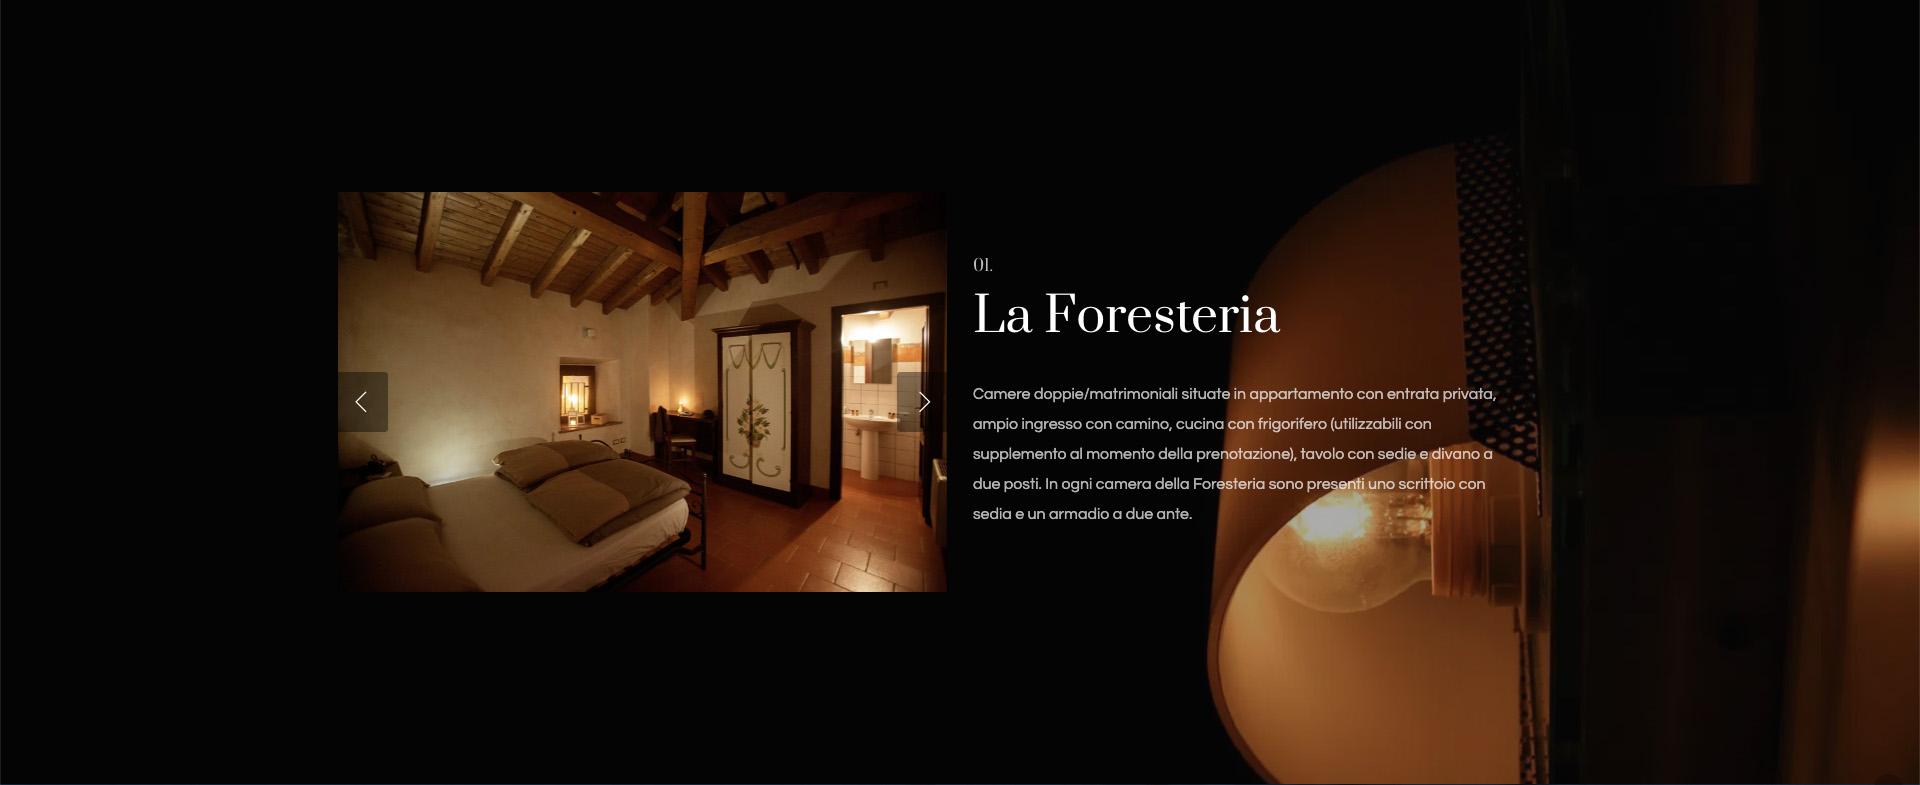 Giorgi Design Studio - Monastero San Erasmo - Web Design - La Foresteria